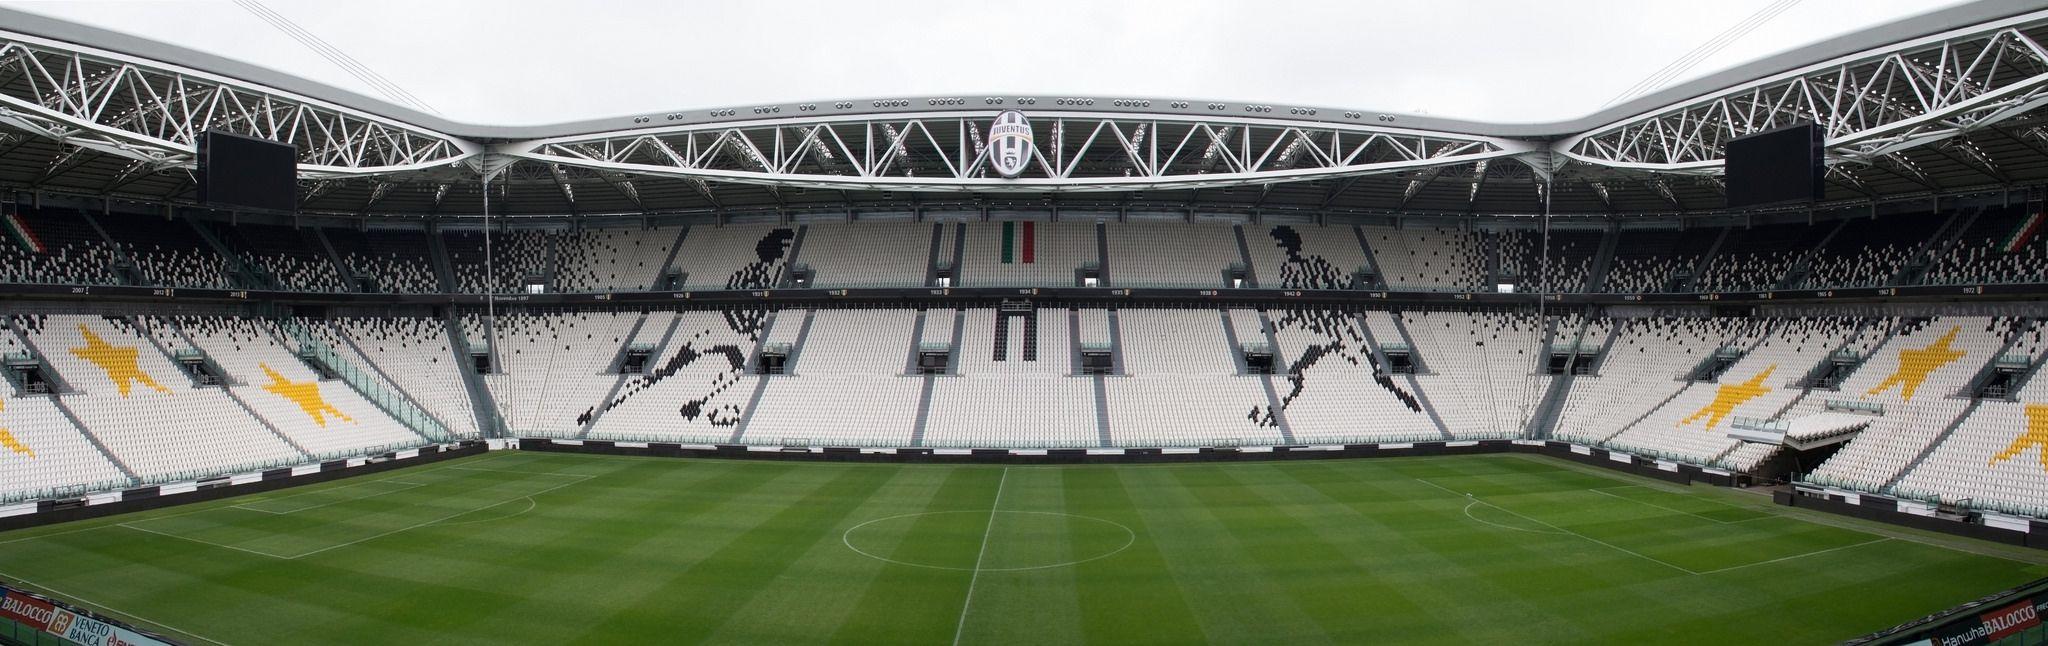 Juventus Stadium: photo, name, capacity 72